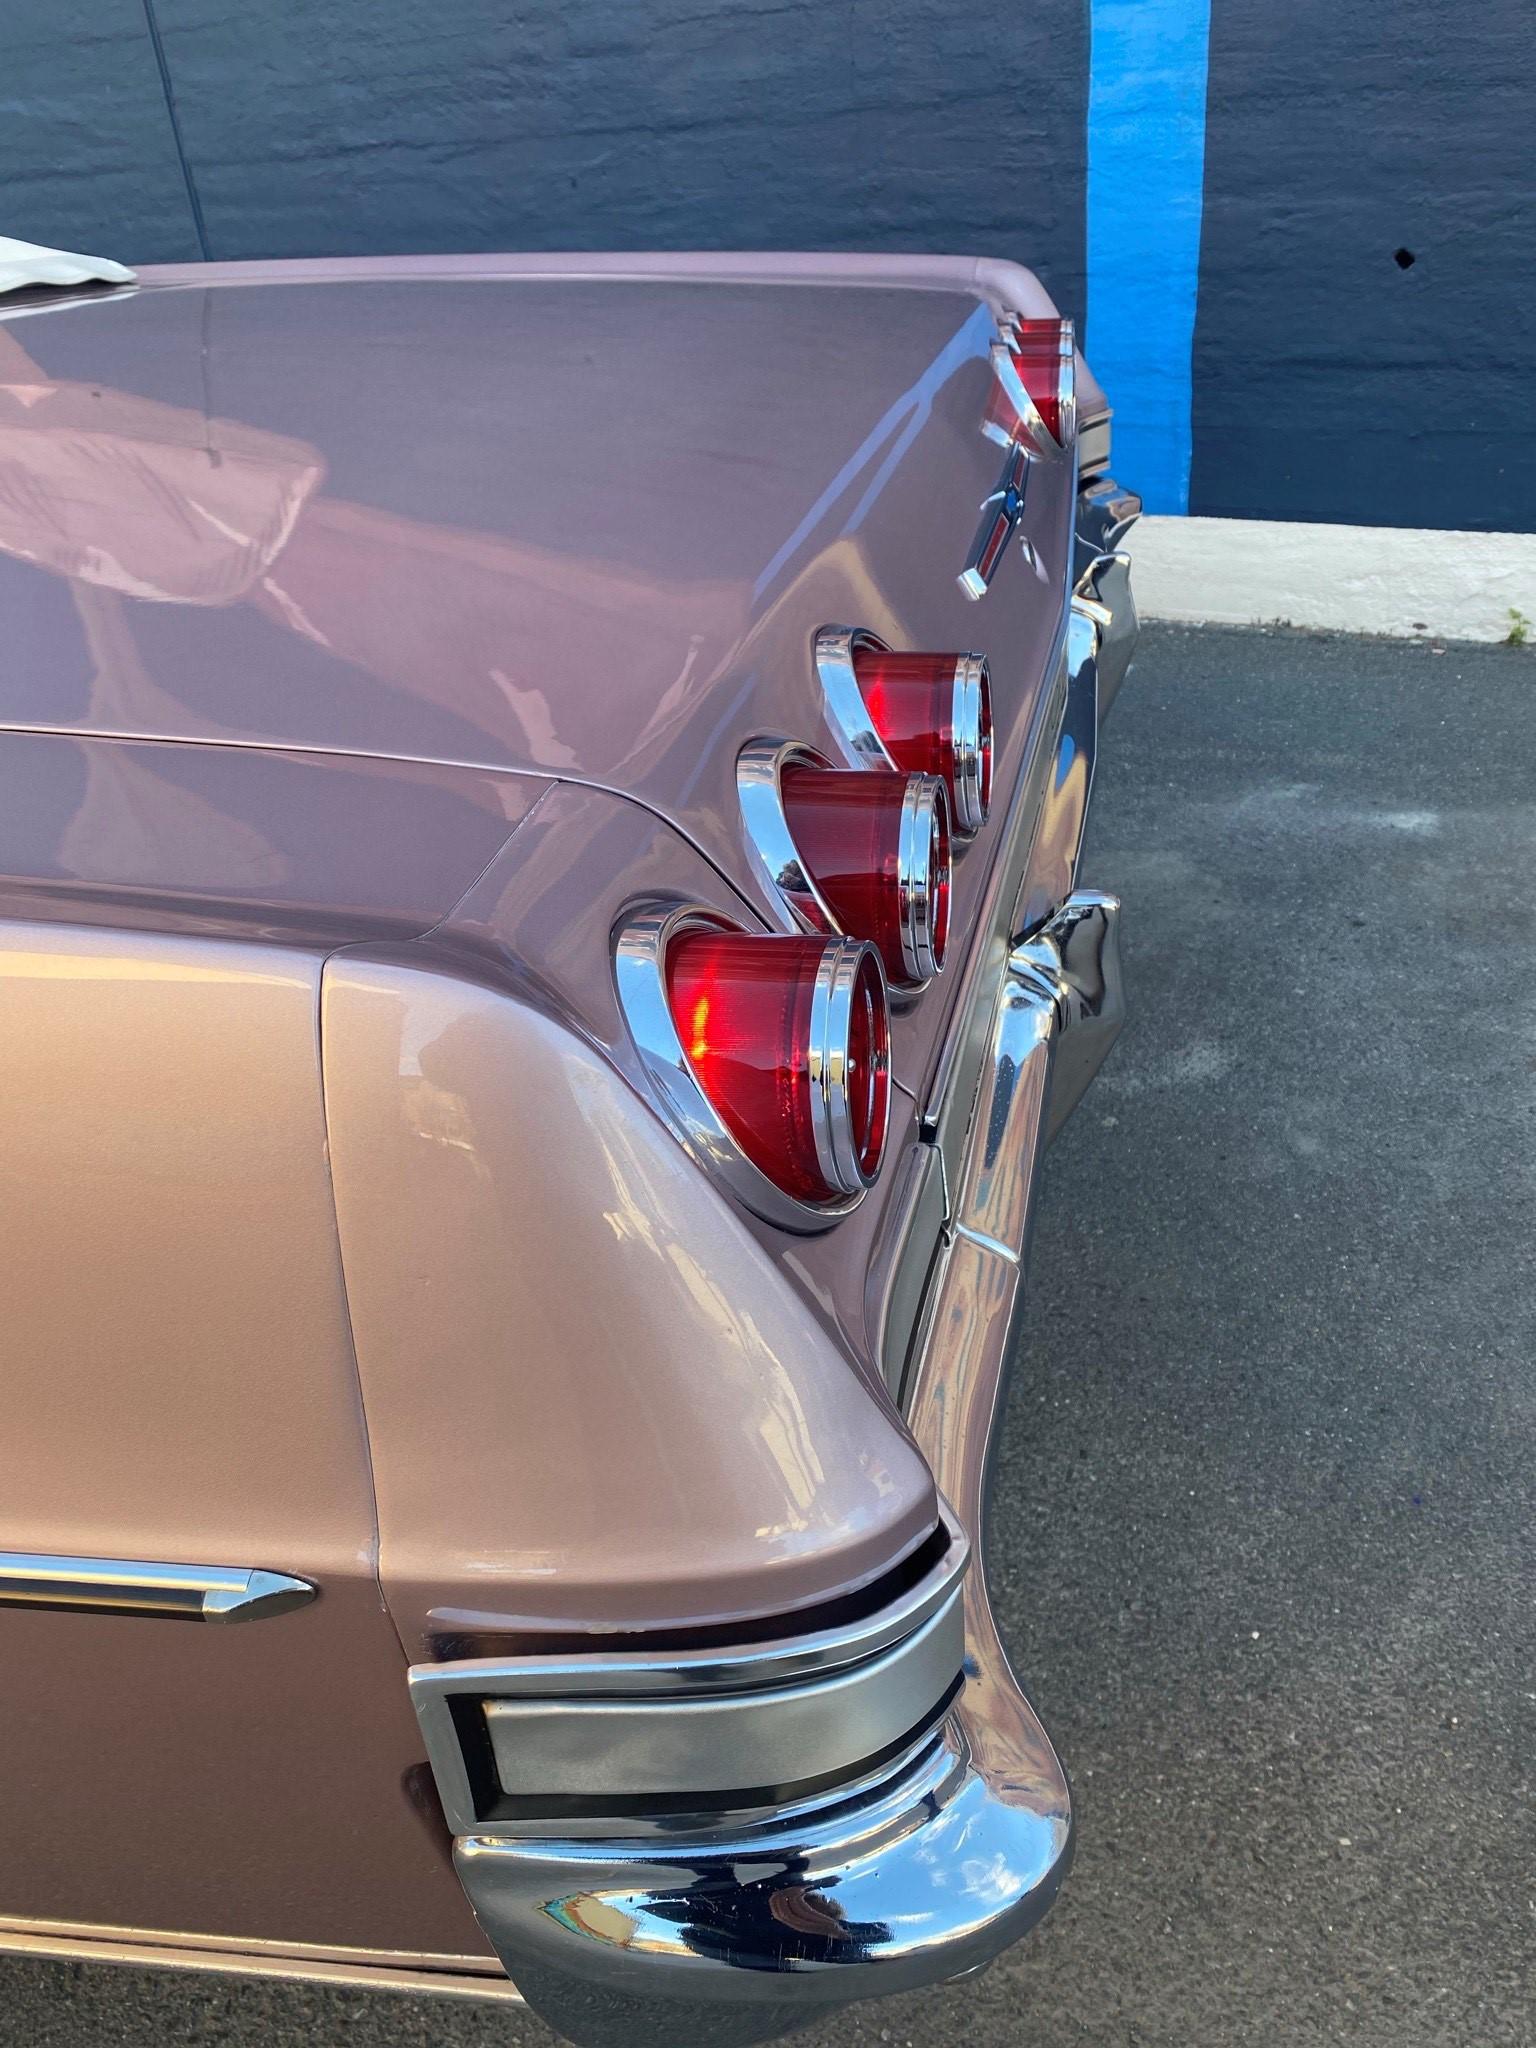 316-1965 Chevrolet Impala convertible 04. Eiere- m